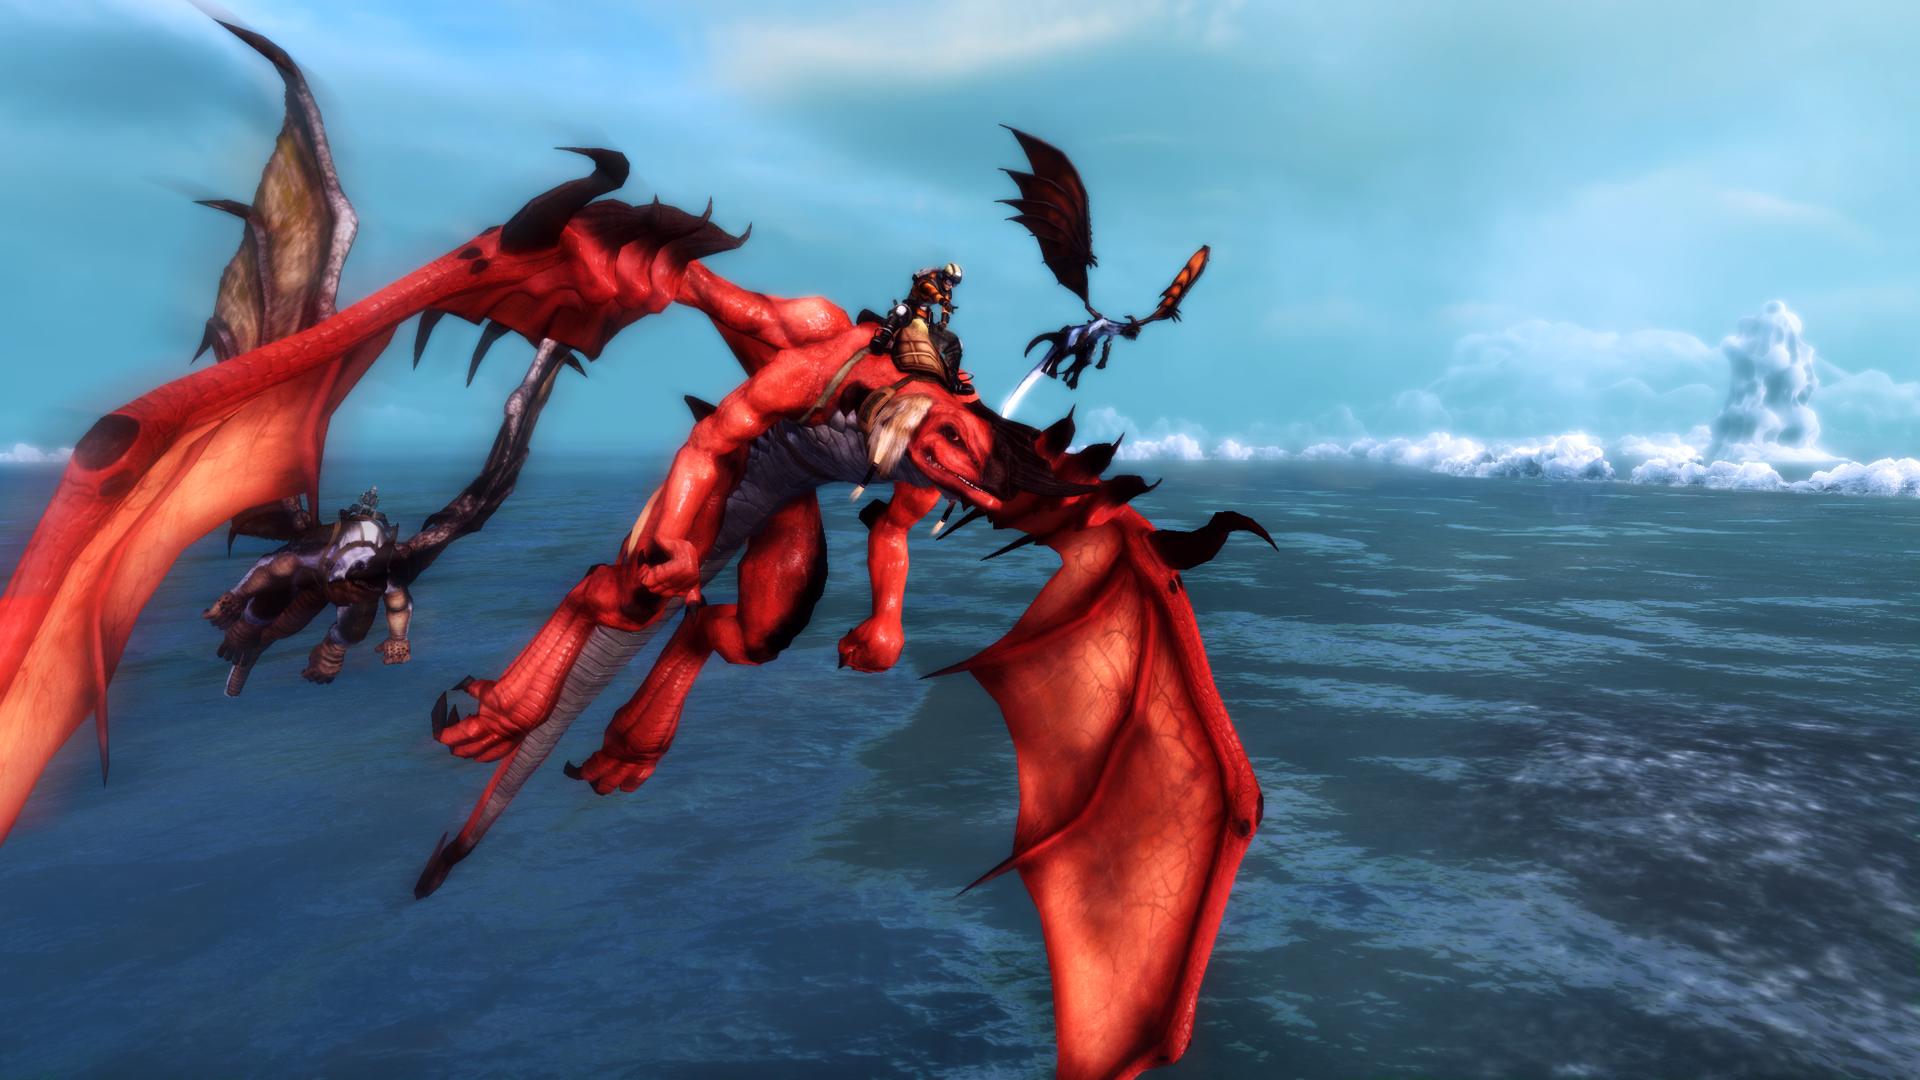 crimson dragon wallpaper - photo #6